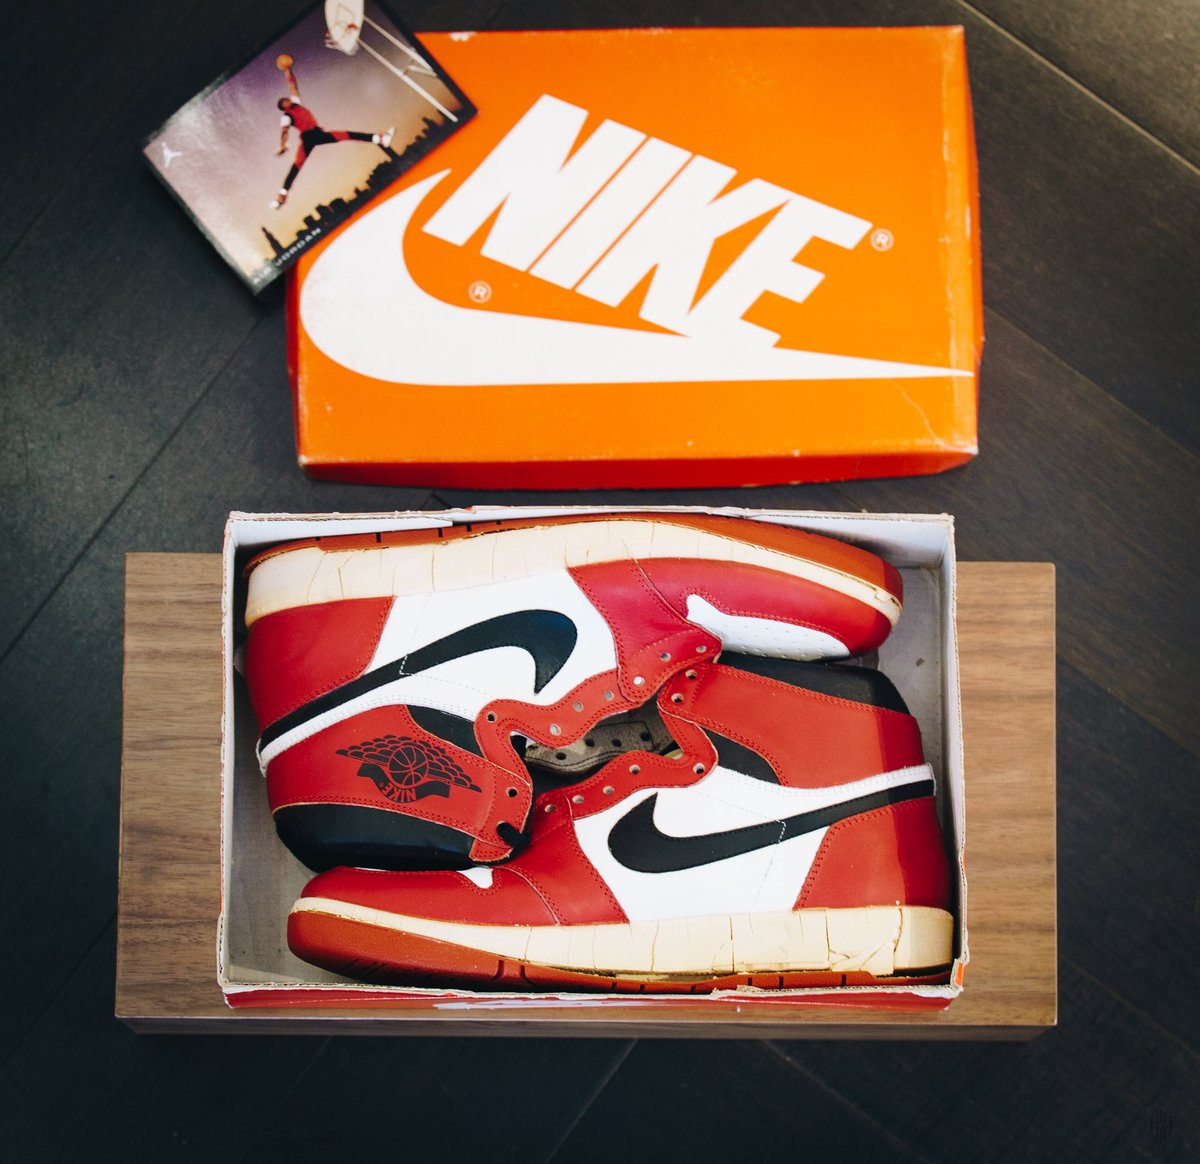 TROPHY ROOM On Twitter We Are Proud To Unveil Michael Jordan OG DS Sneakers Exclusive Memorabilia In New Trophy Case Layout TrophyRoomStore Jumpman23